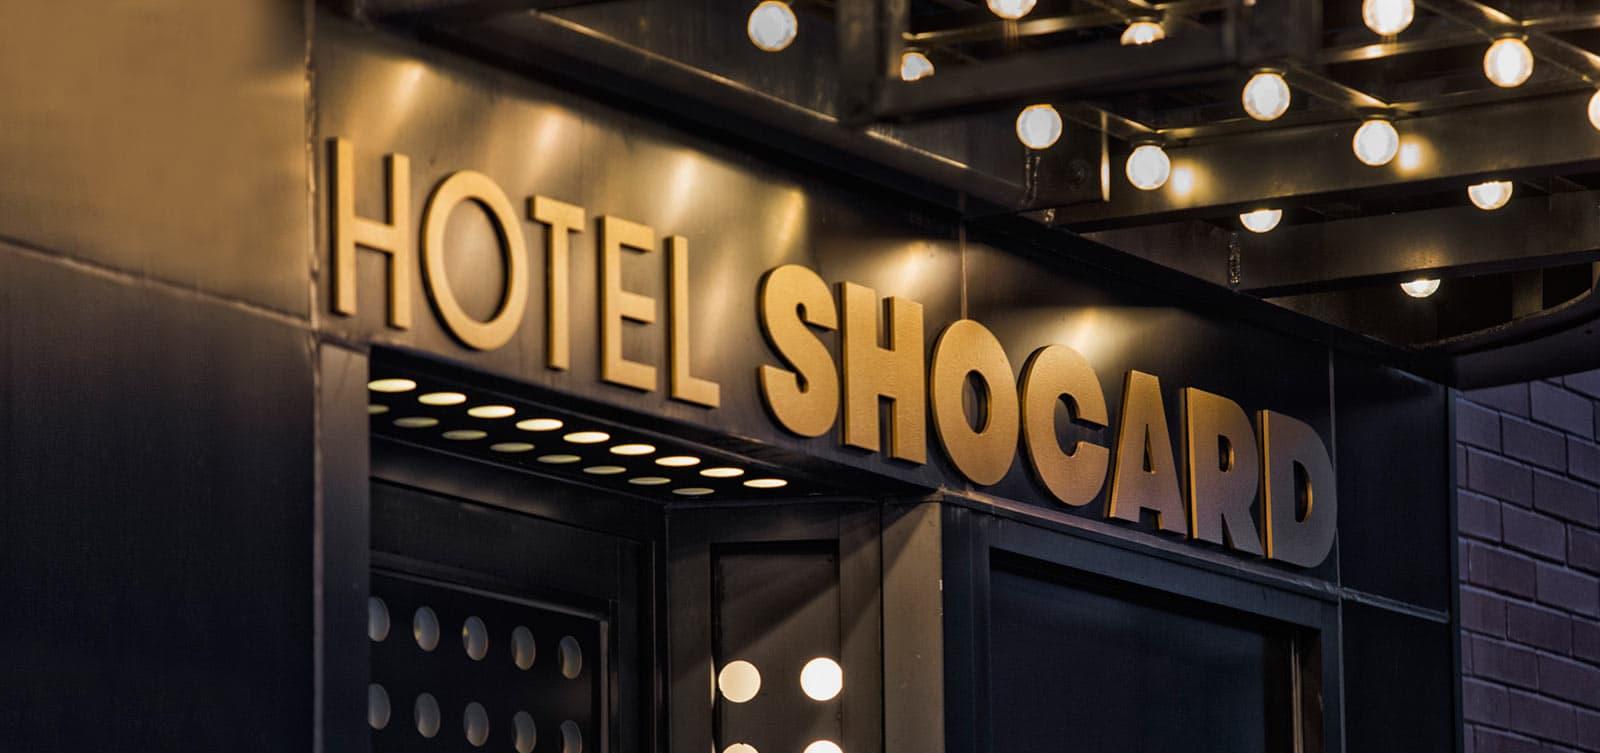 Hotel Shocard, New York